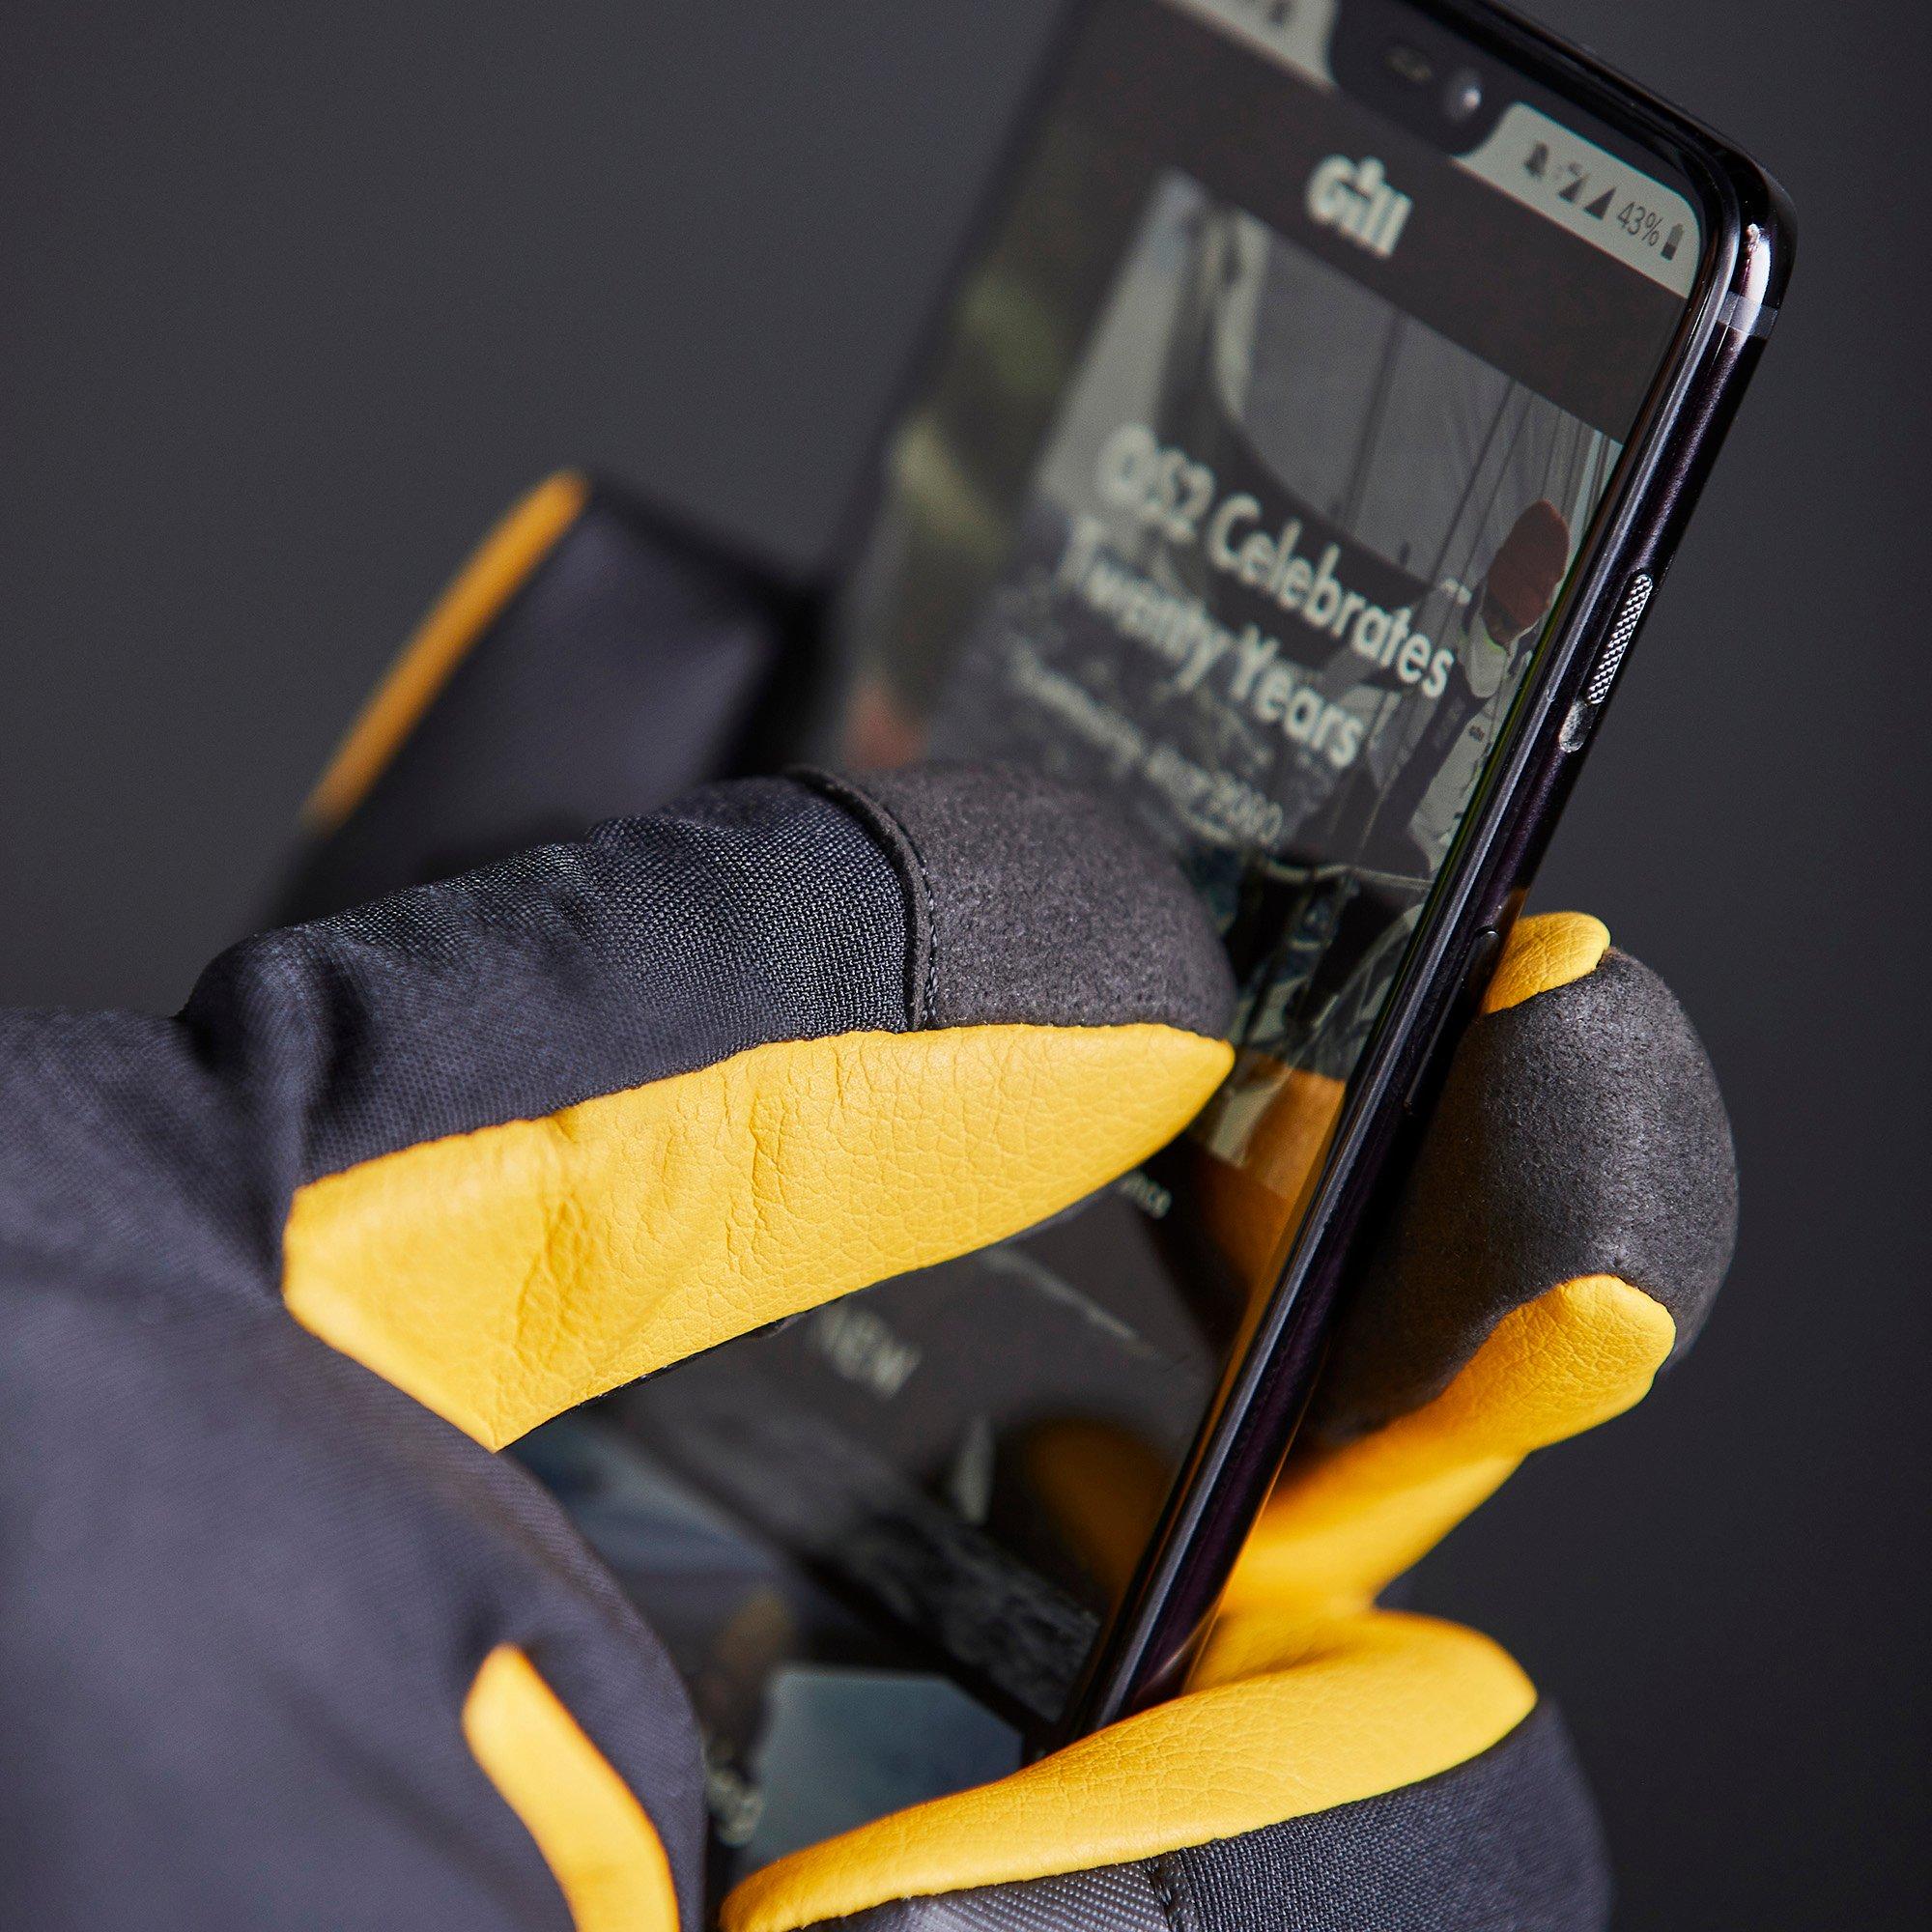 Helmsman-Handschuhe - 7805-BLK01-MODEL_6.jpg